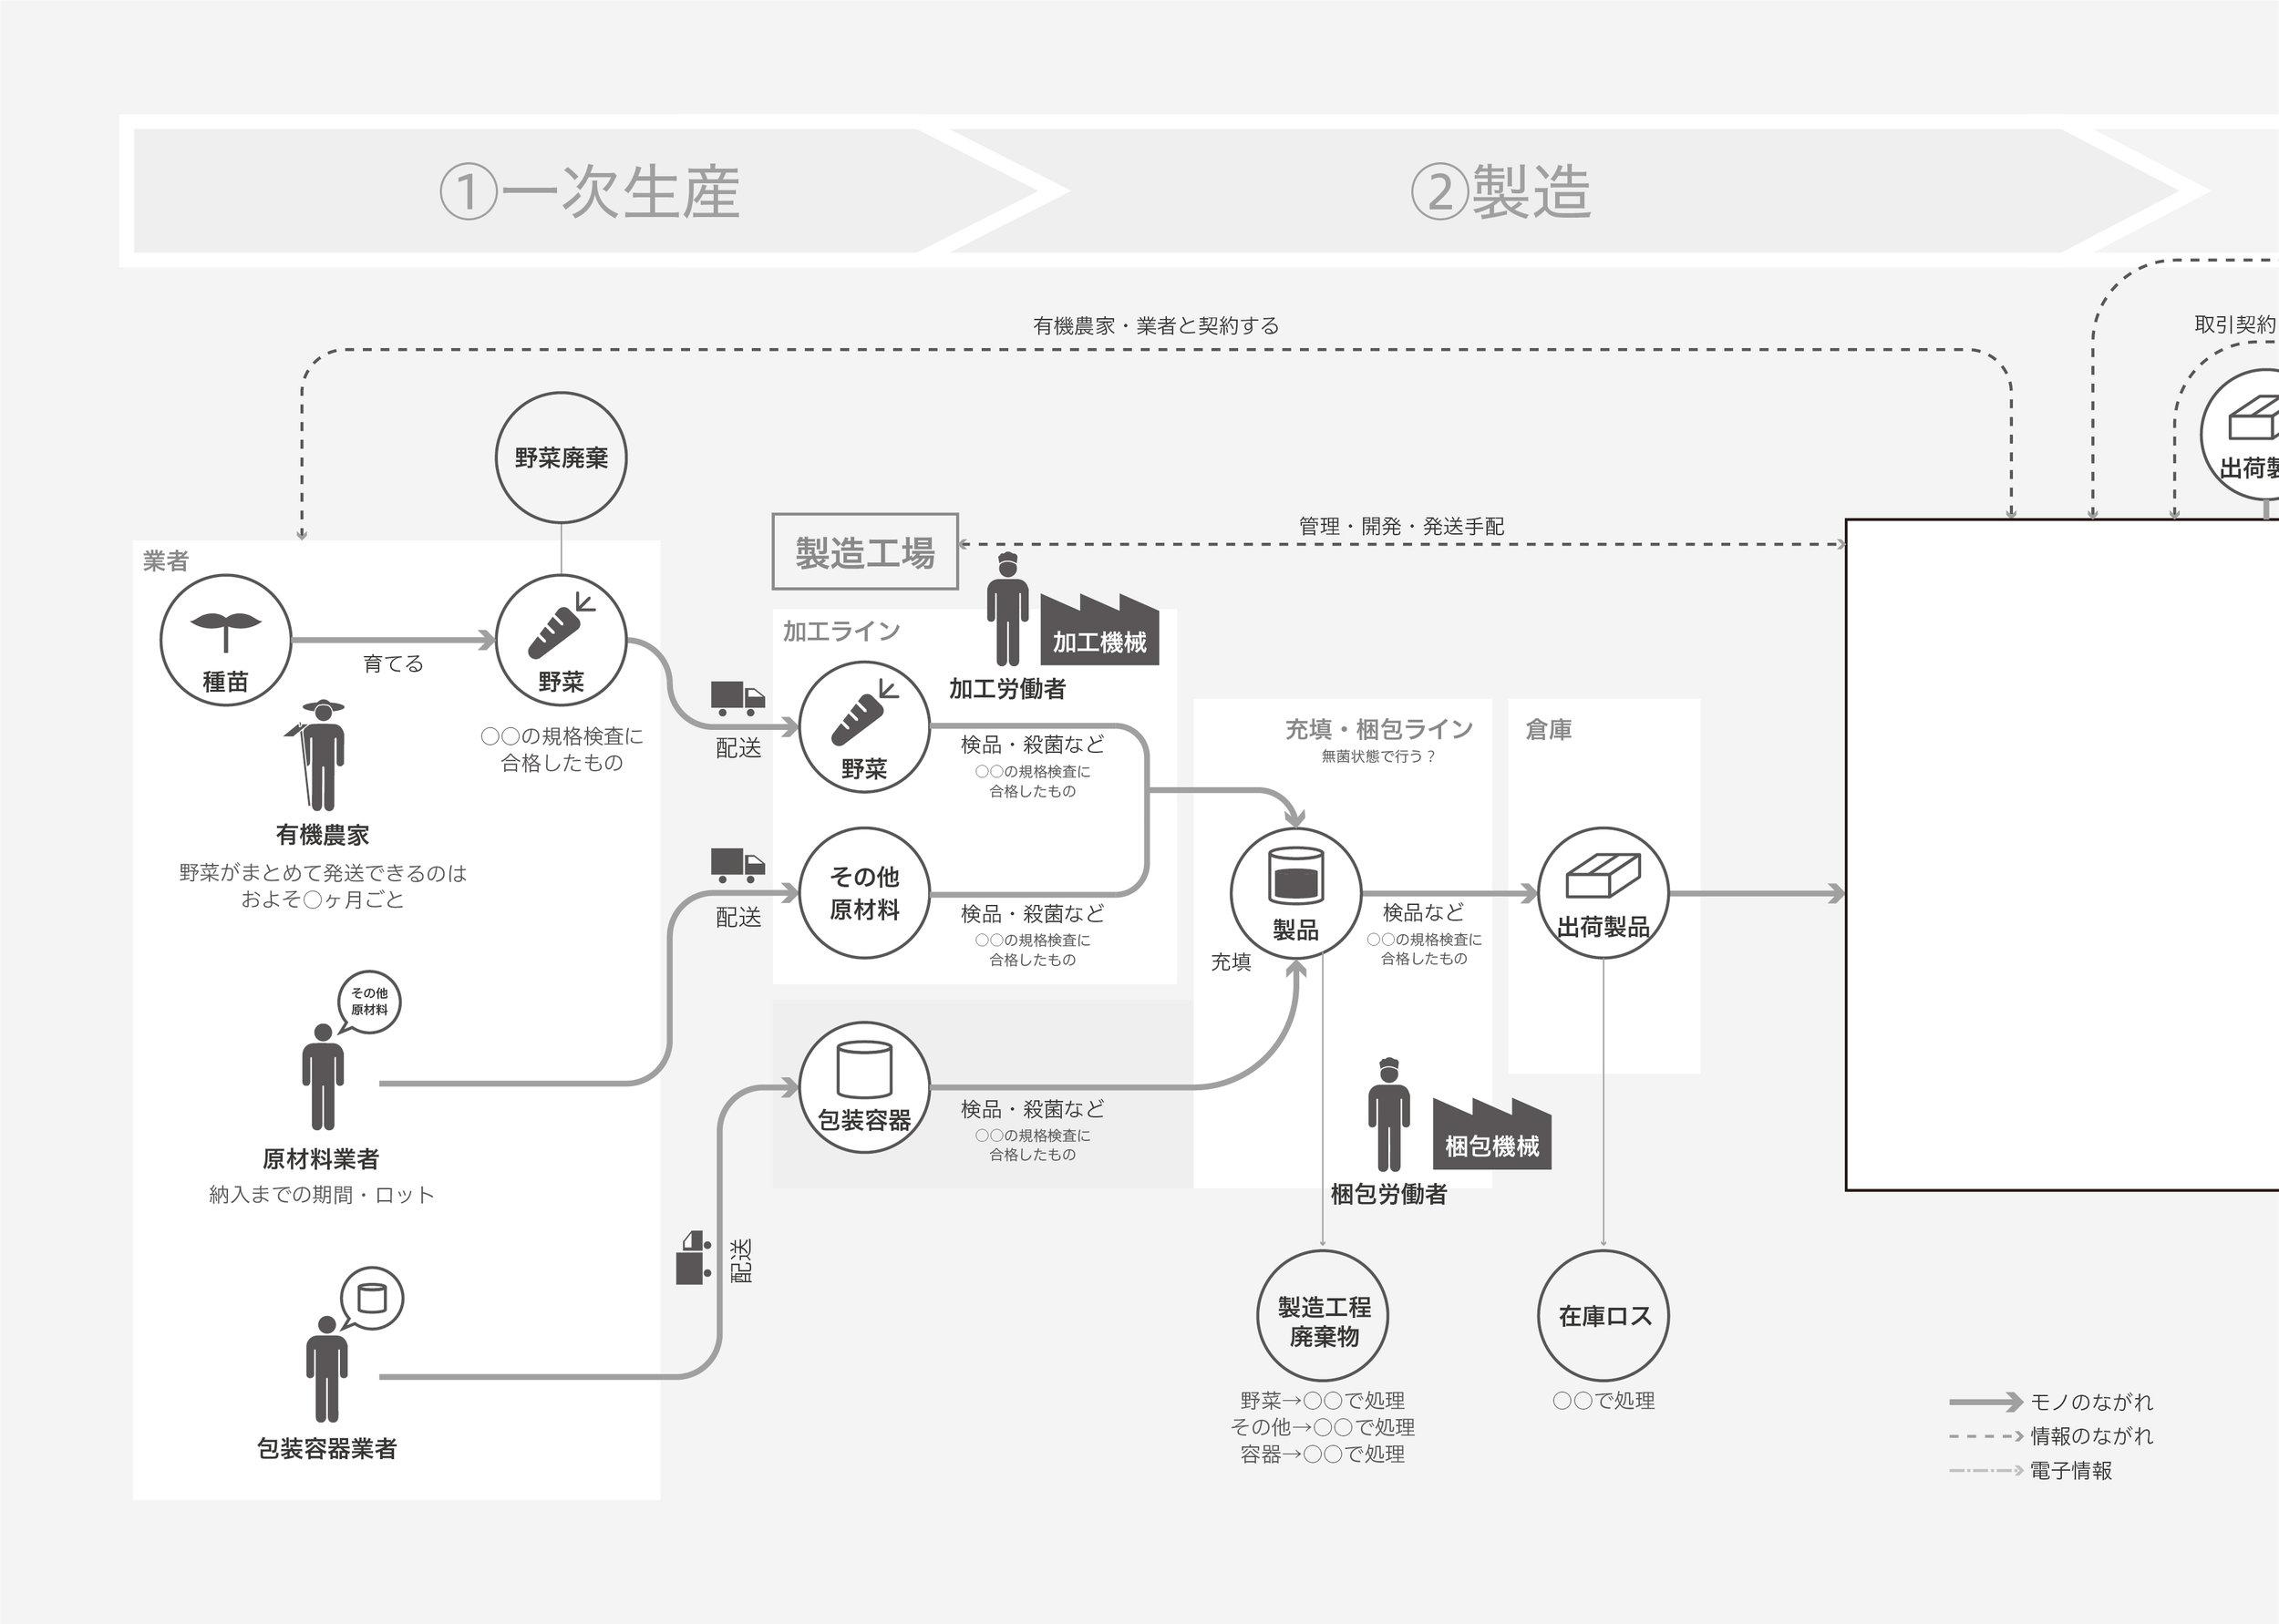 RELATIONMAP - ビジネスの一連の流れや関係性を可視化